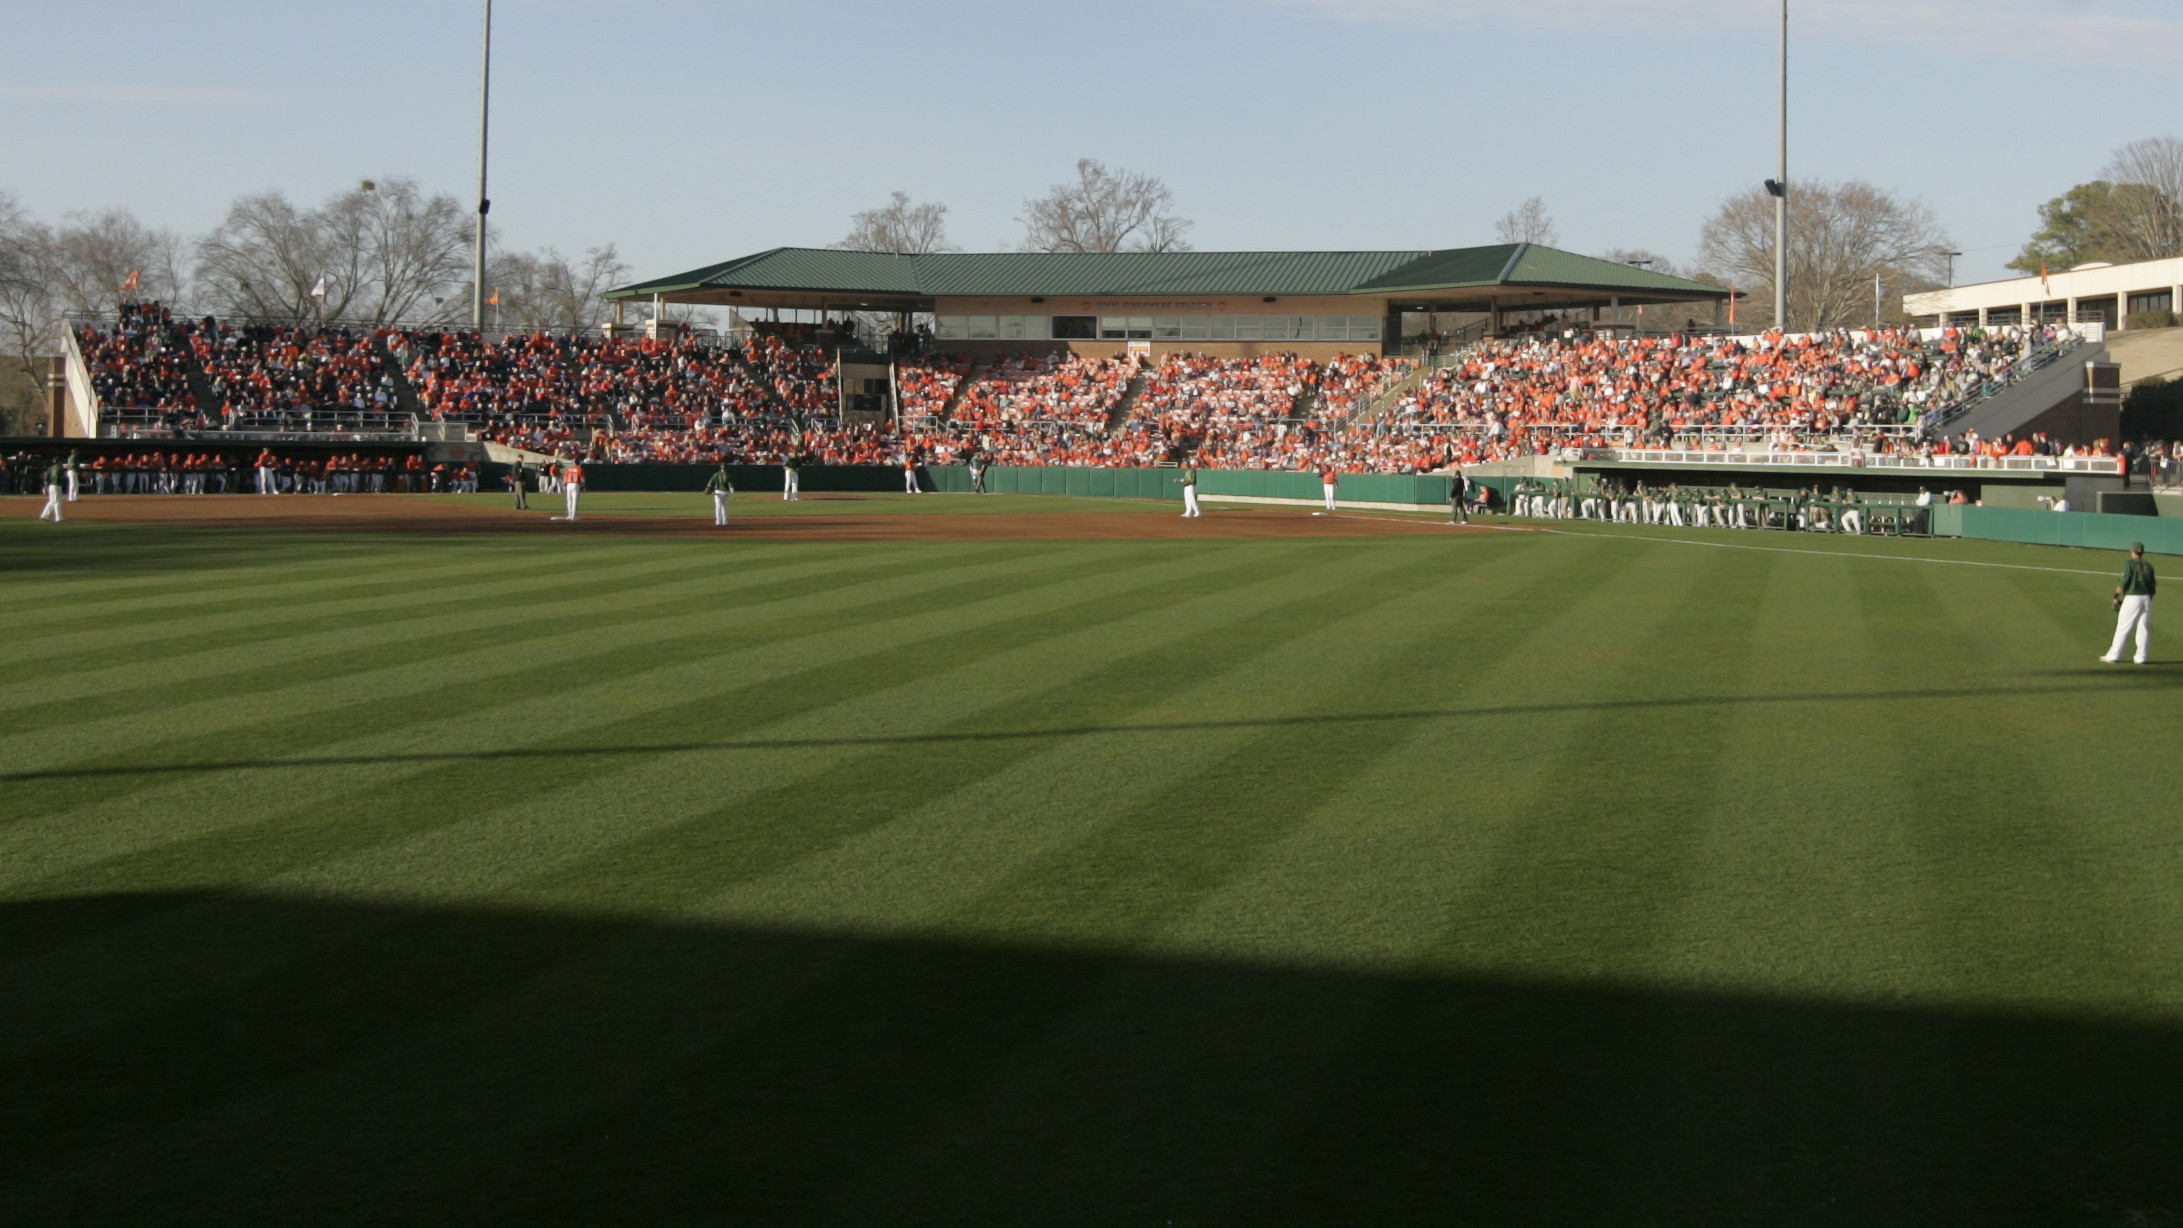 Ticket Promotions Announced for 2013 Clemson Baseball Season